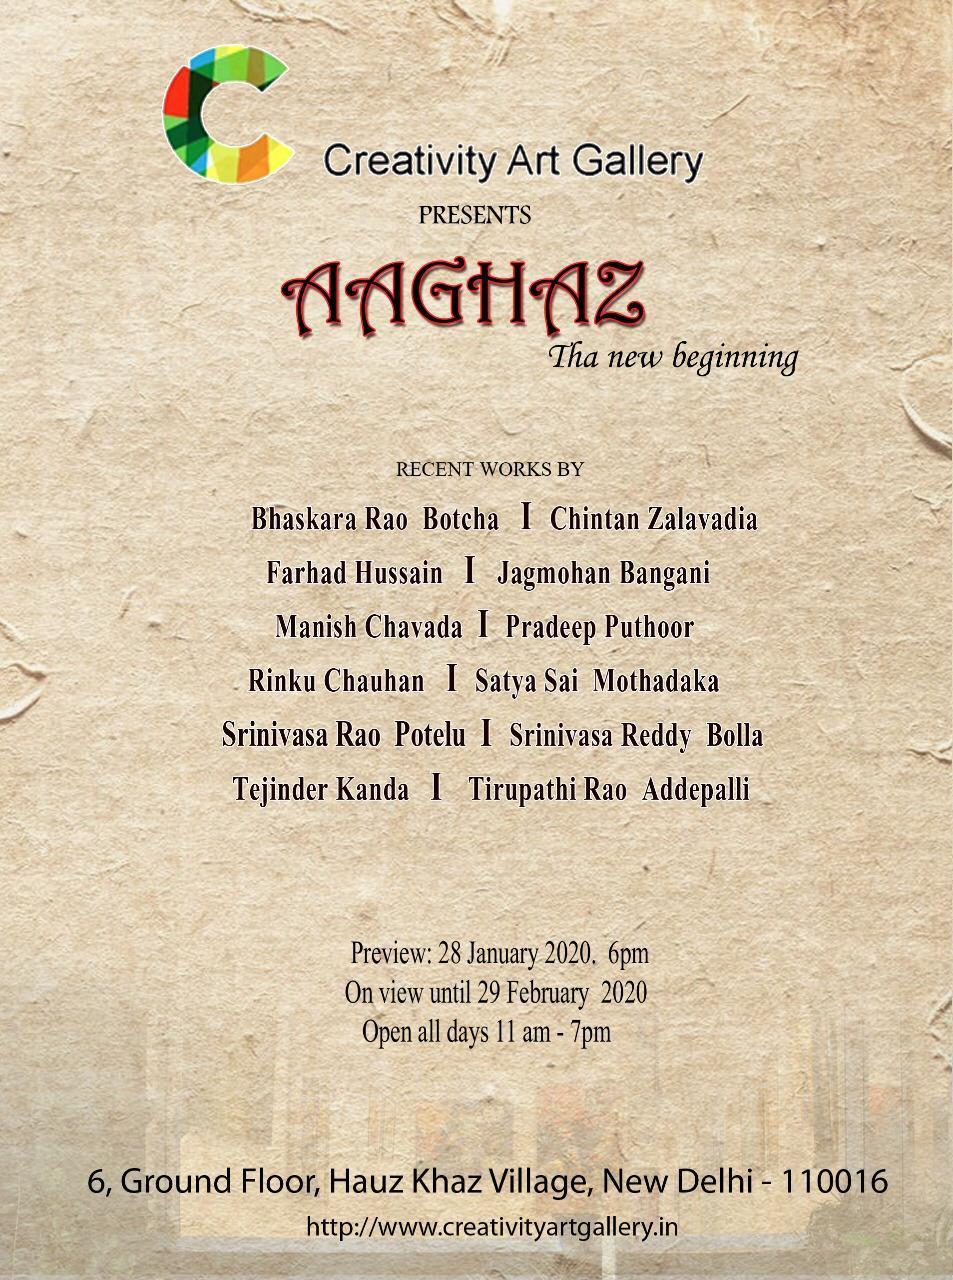 Aaghaz – the New Beginning